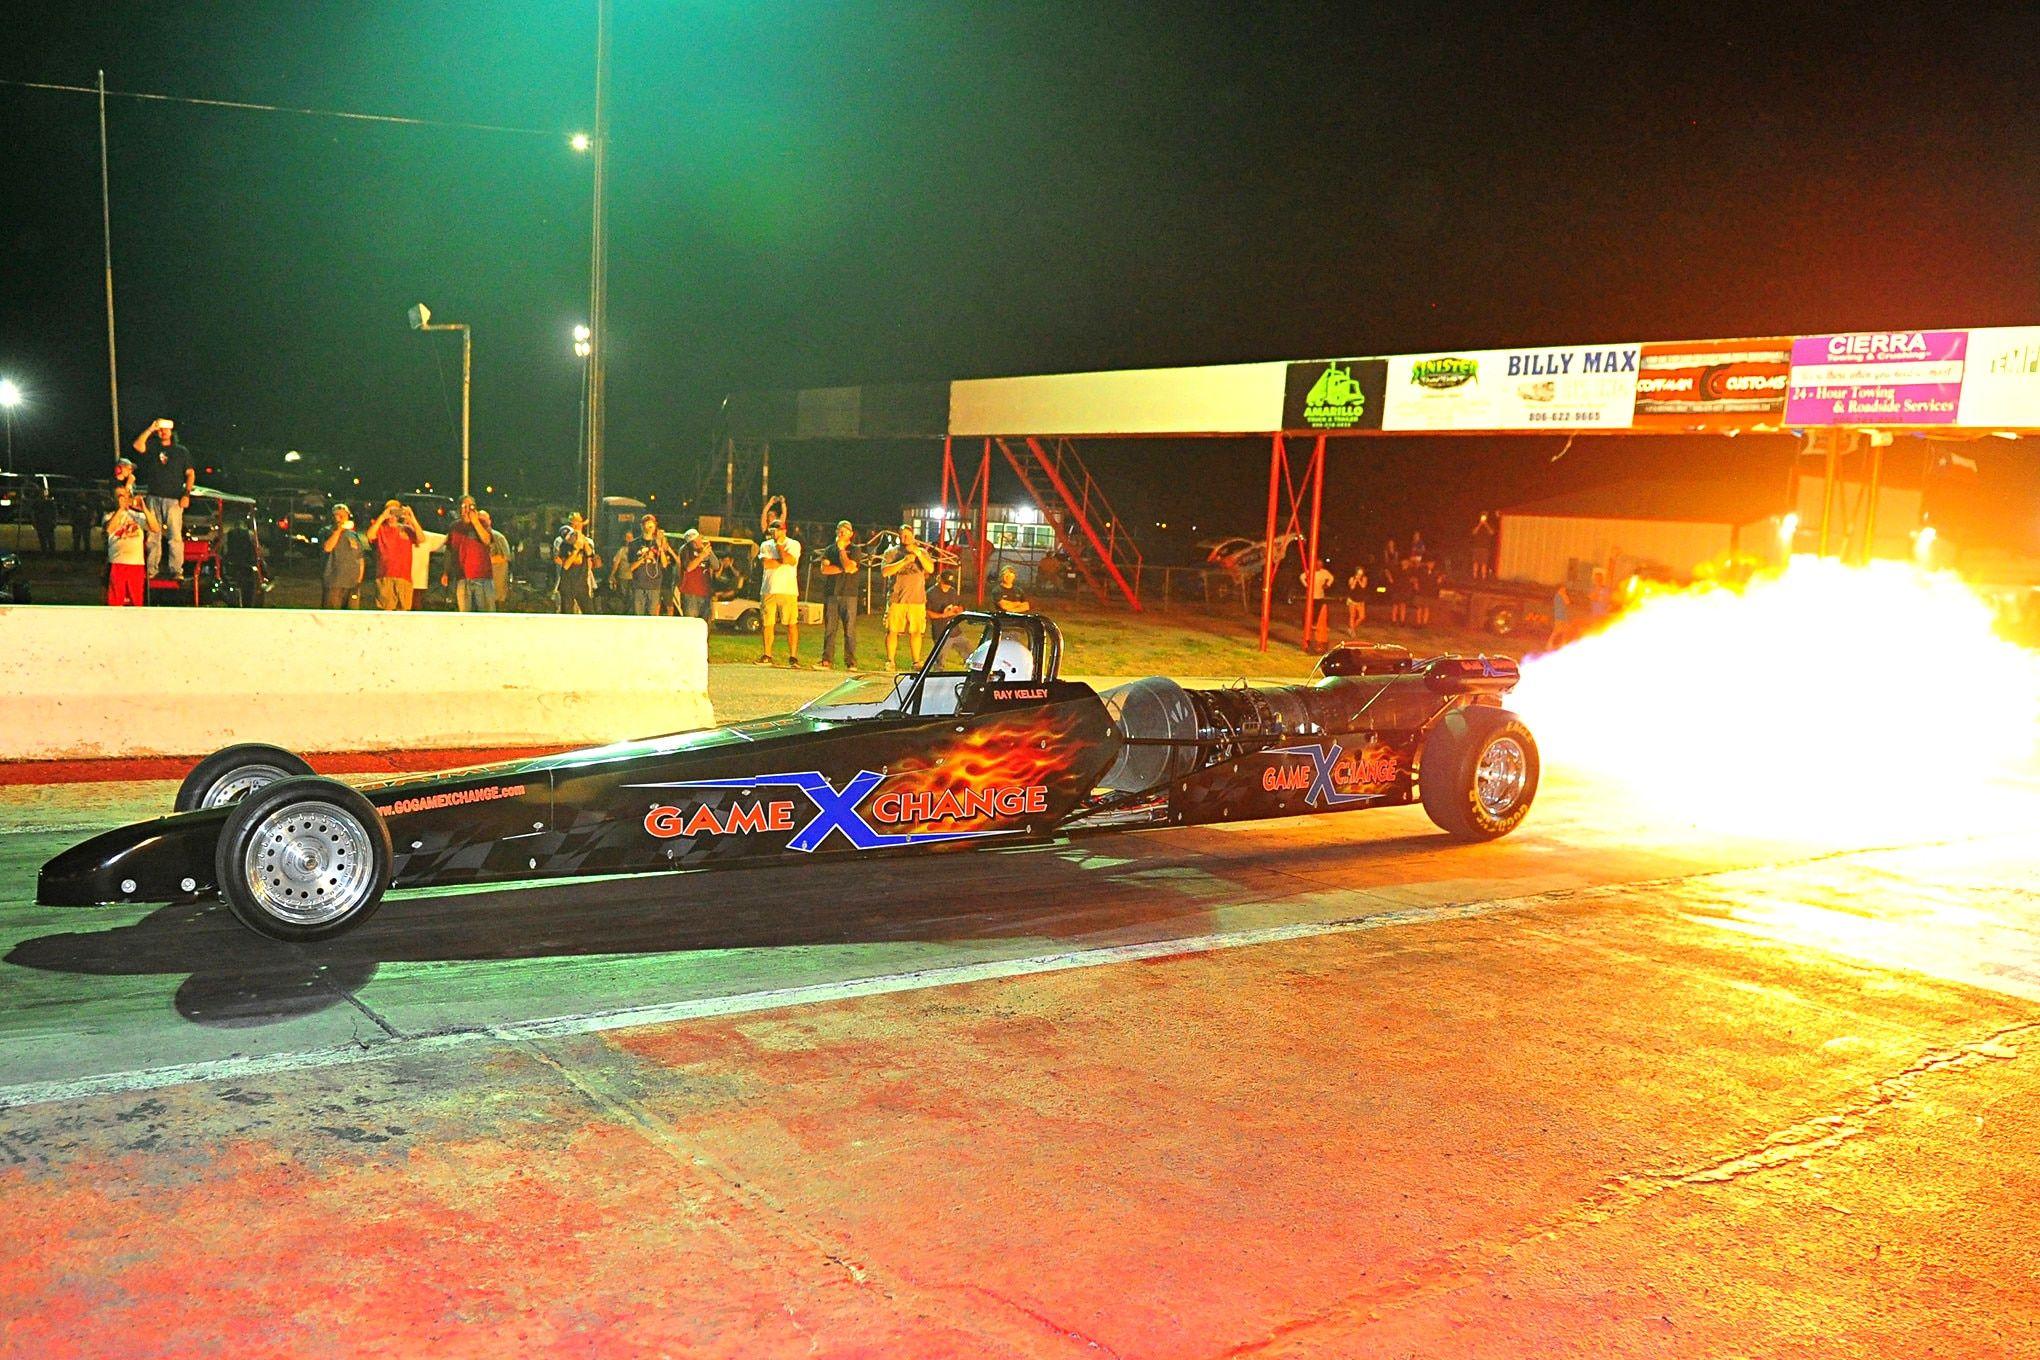 Funnycarchaosamarillodragway car humor car drag racing